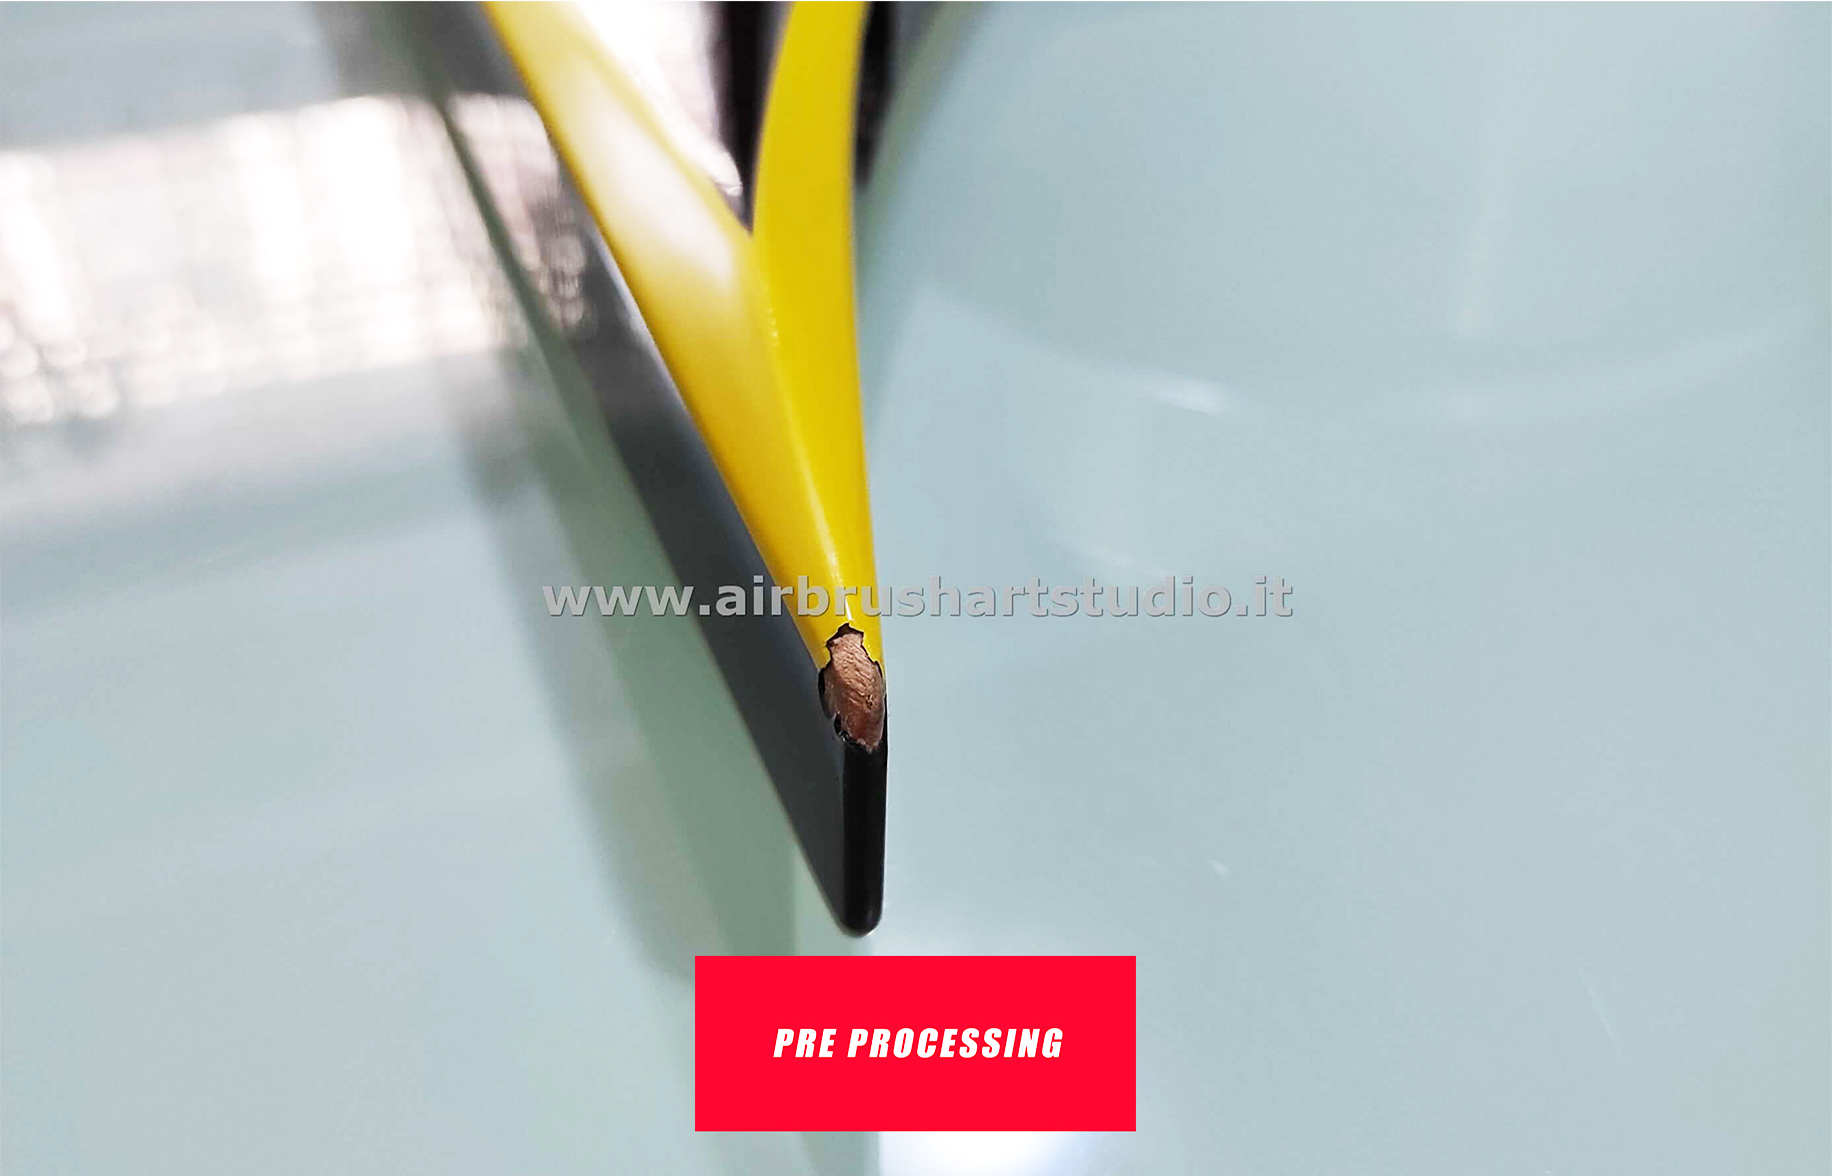 PRE-airbrushartstudio_it-aerografie-padova-italy-jackson-electricguitars (14)